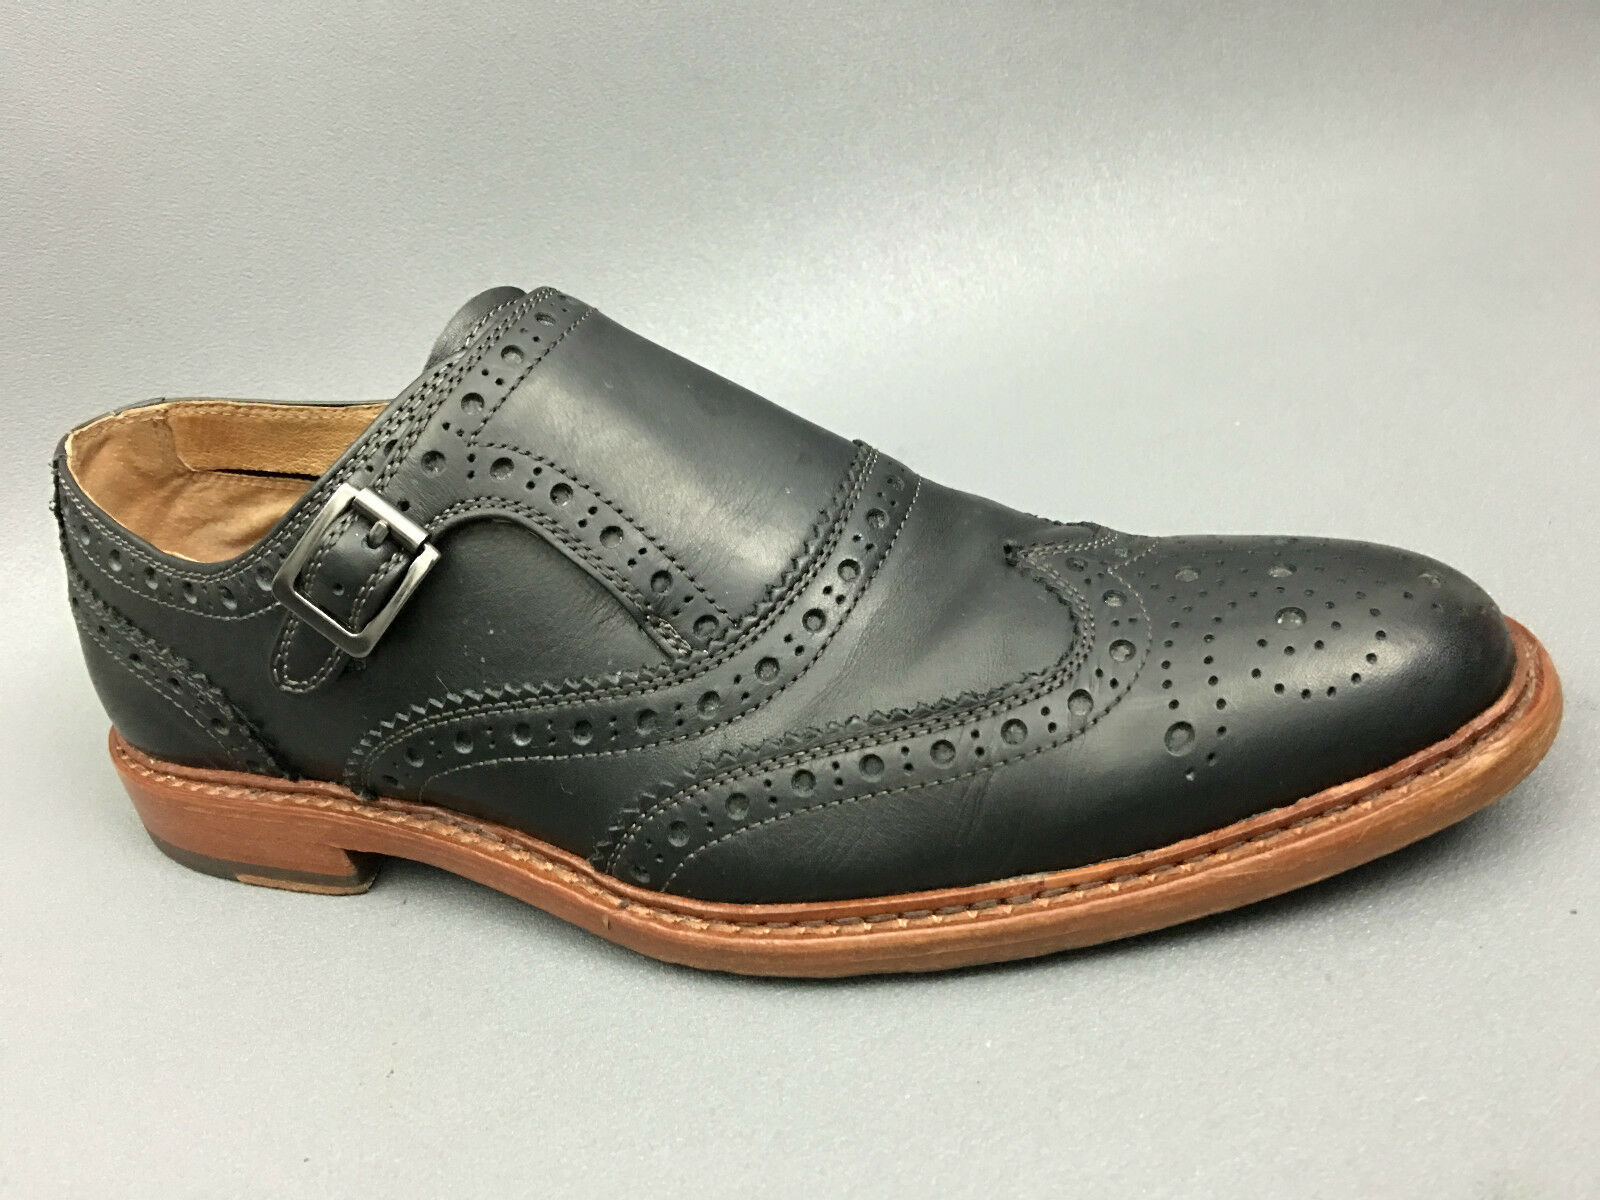 J&M J&M J&M Est.1850 McGavock nero Monk Strap Brogue Wingtip Dress scarpe Dimensione 10 USA. a4190b